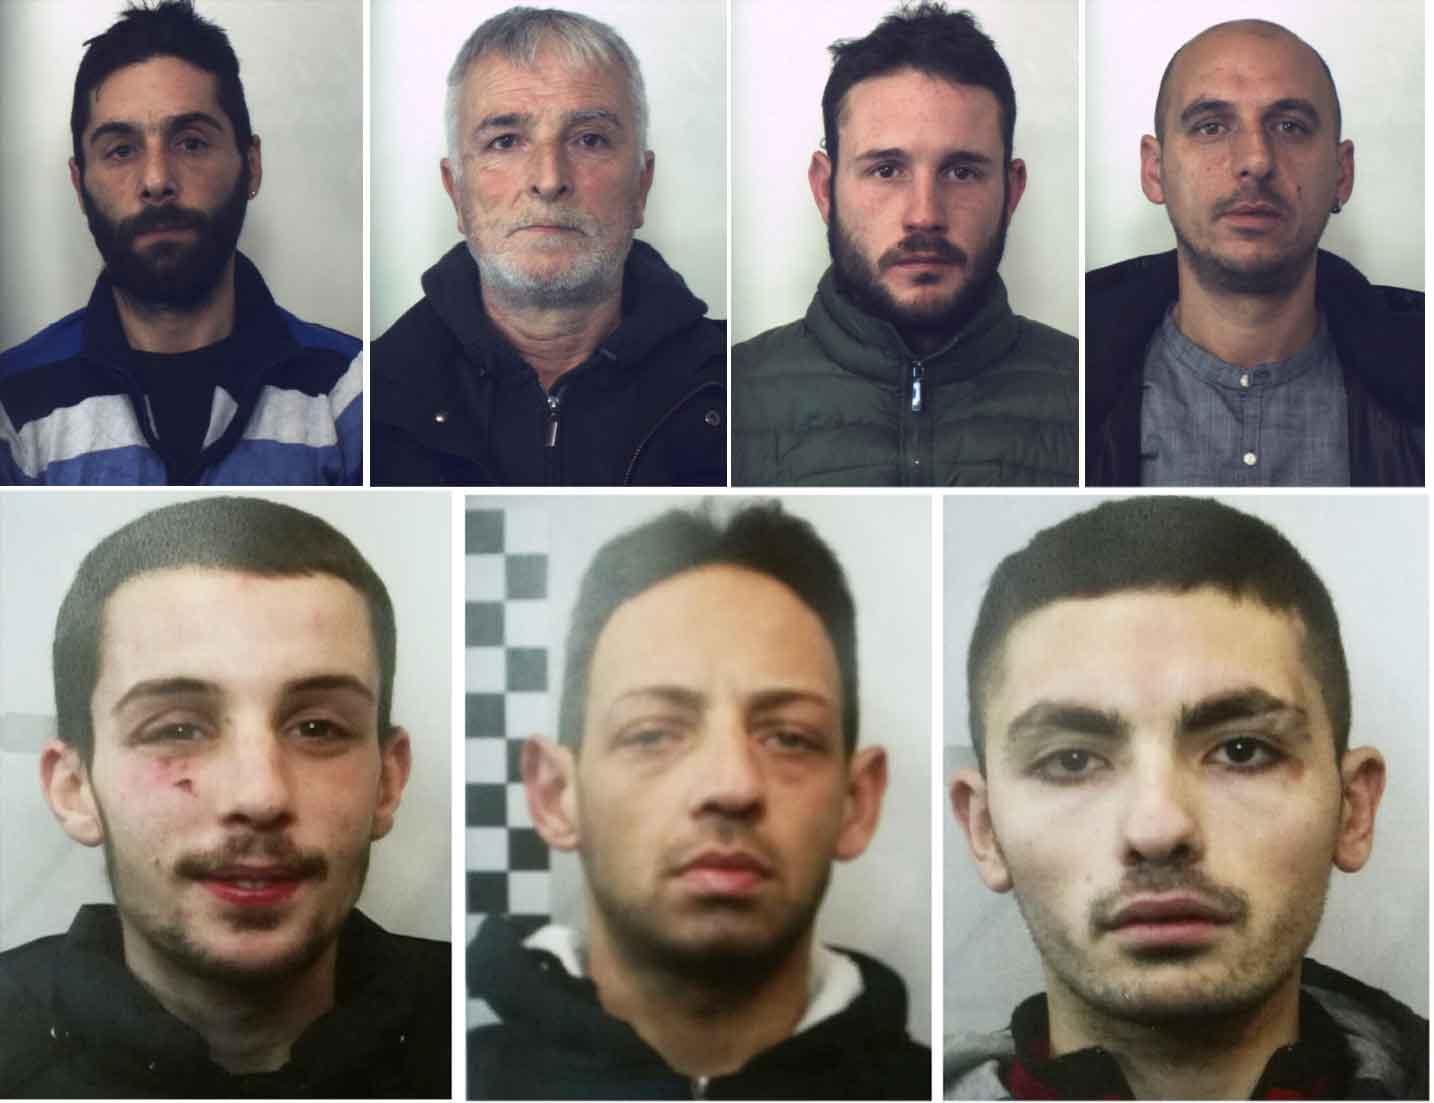 Operazione Predator Sette Arresti A Cosenza Foto Nomi